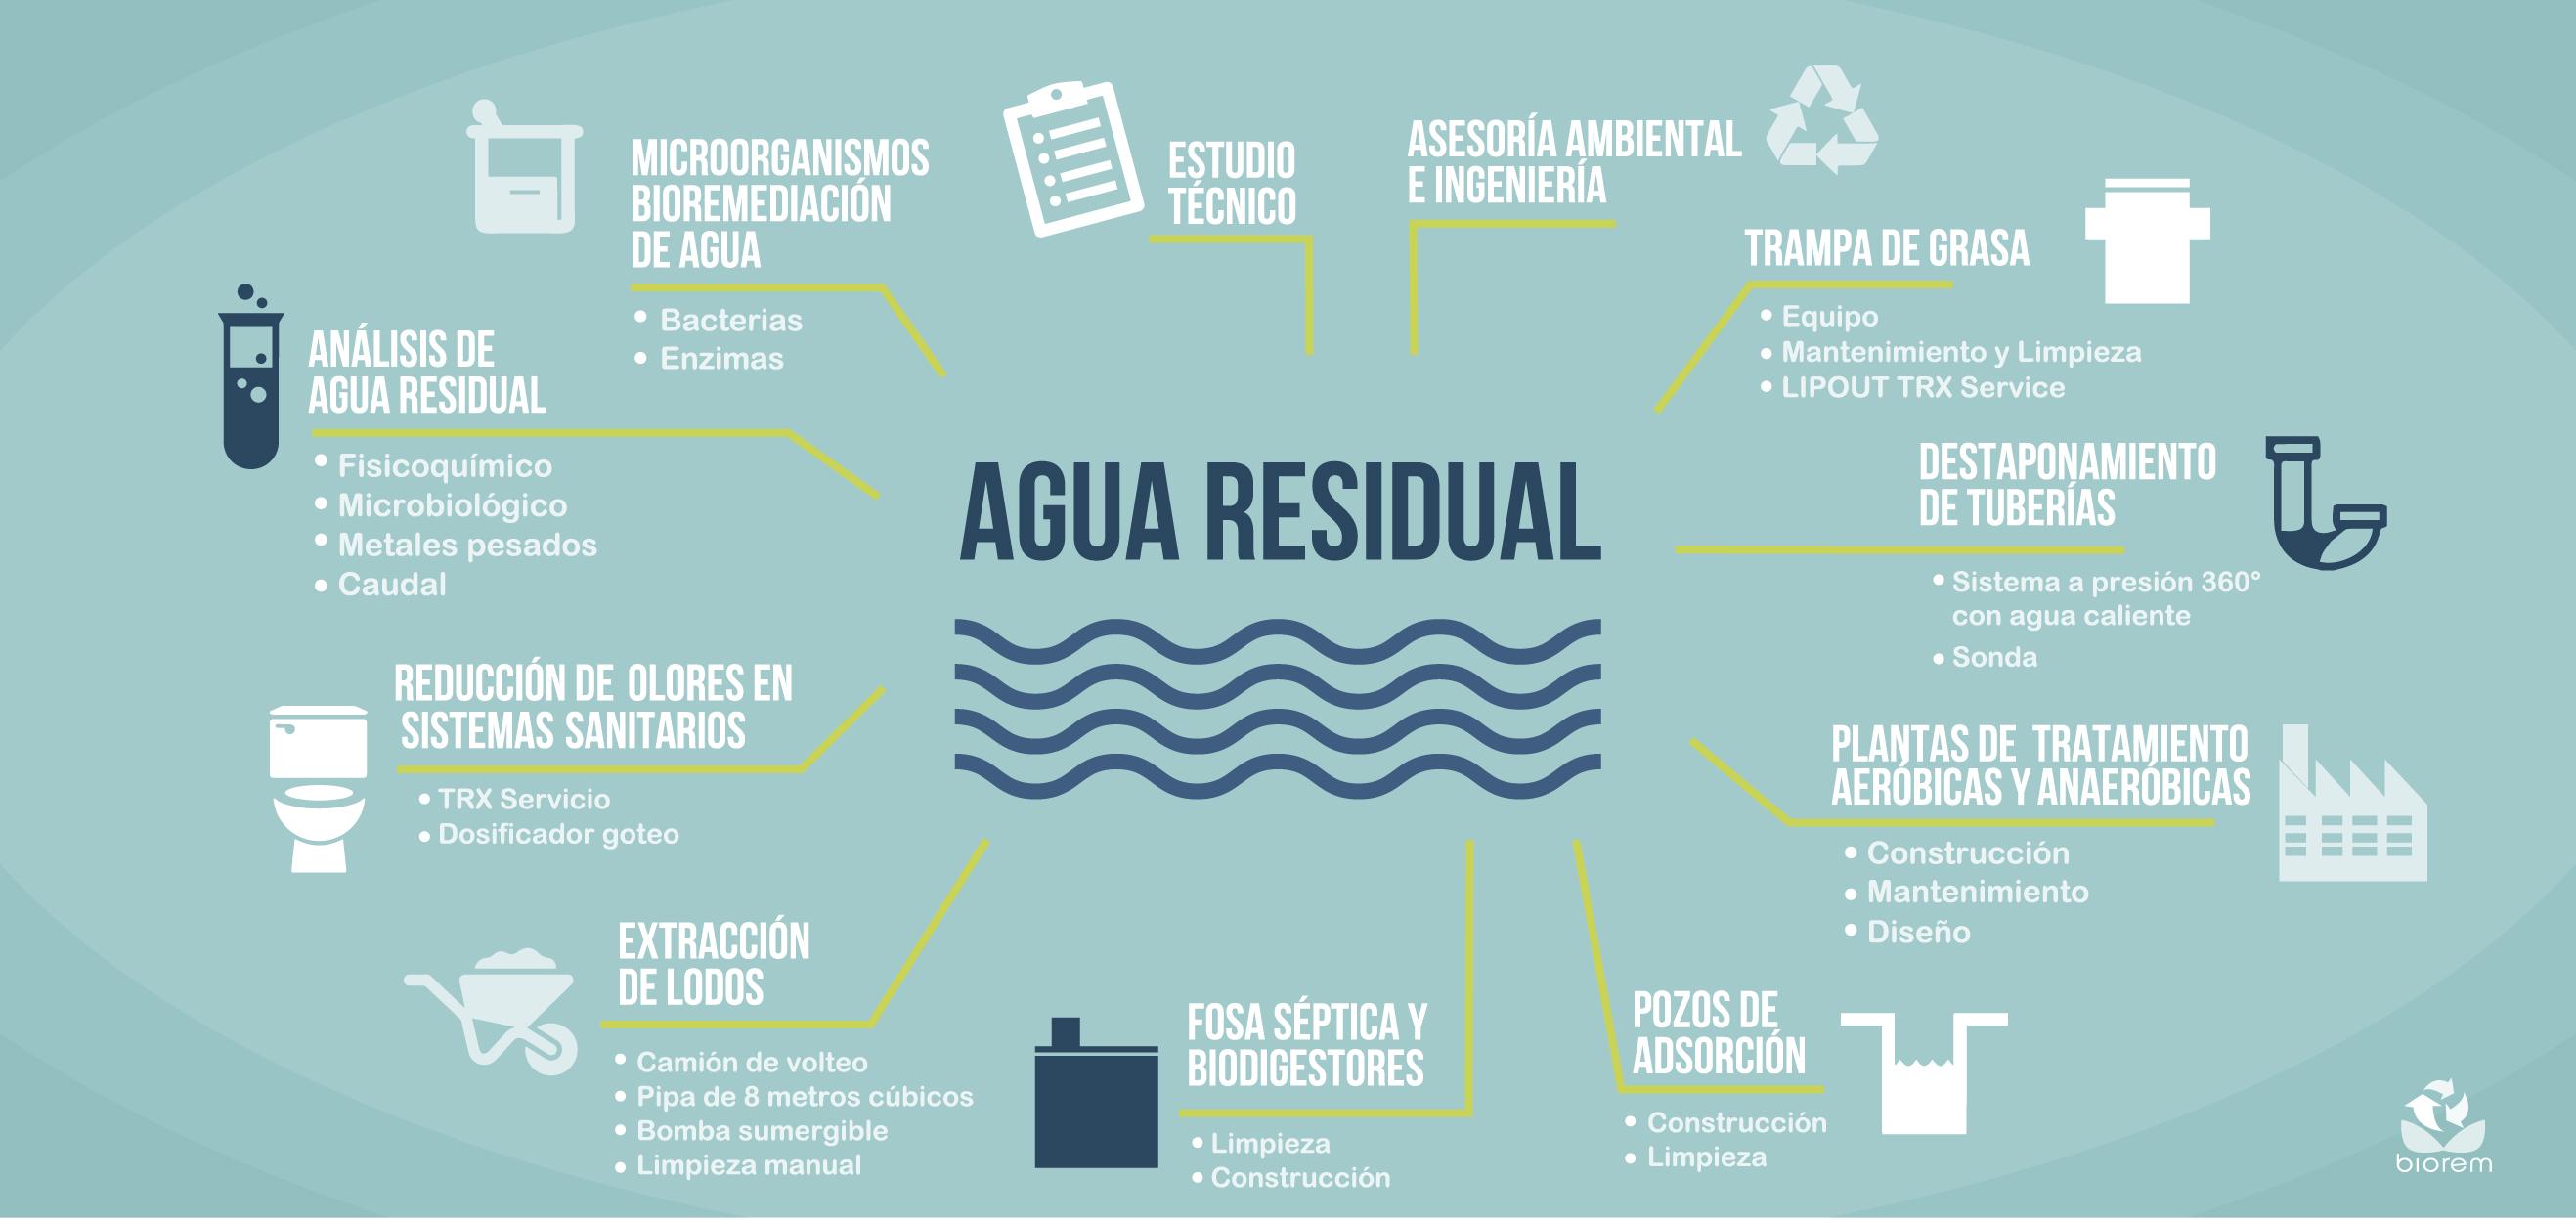 Servicios BIOREM-Agua Residual